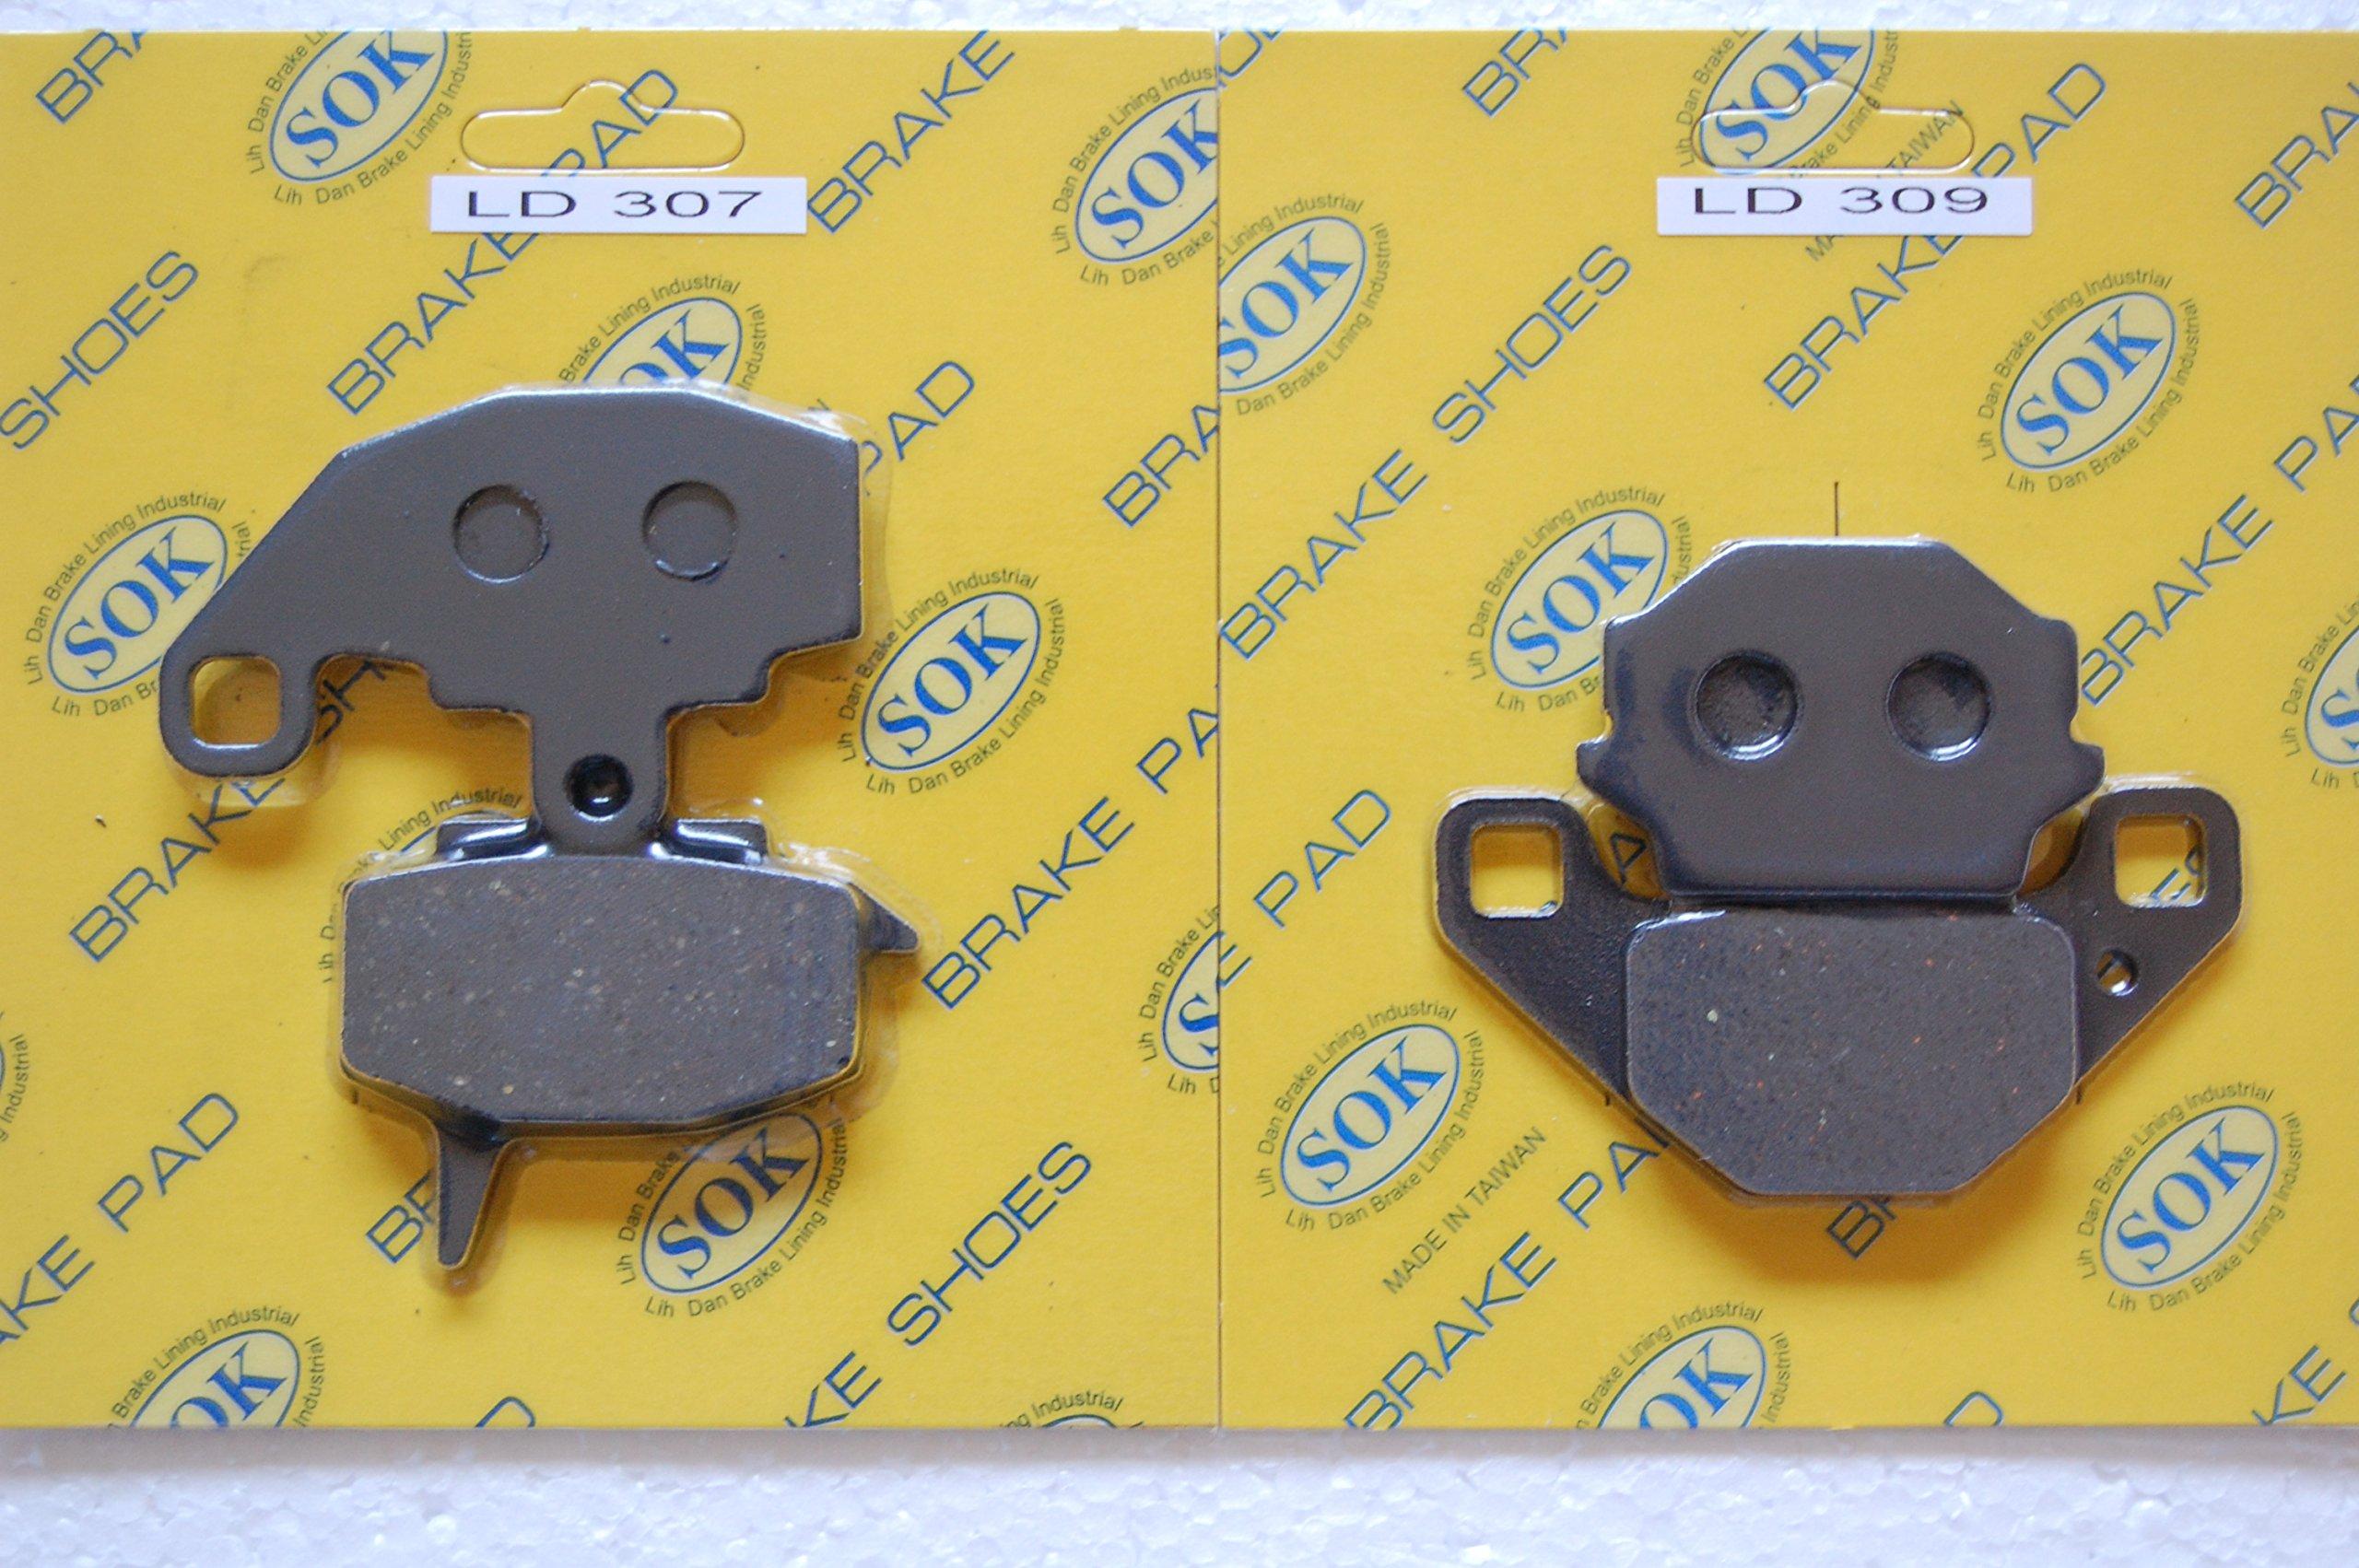 FRONT&REAR BRAKE PADS KAWASAKI KLR 650, 1987-2007 KLR650 KL 650 KL650 (LD307 LD309)